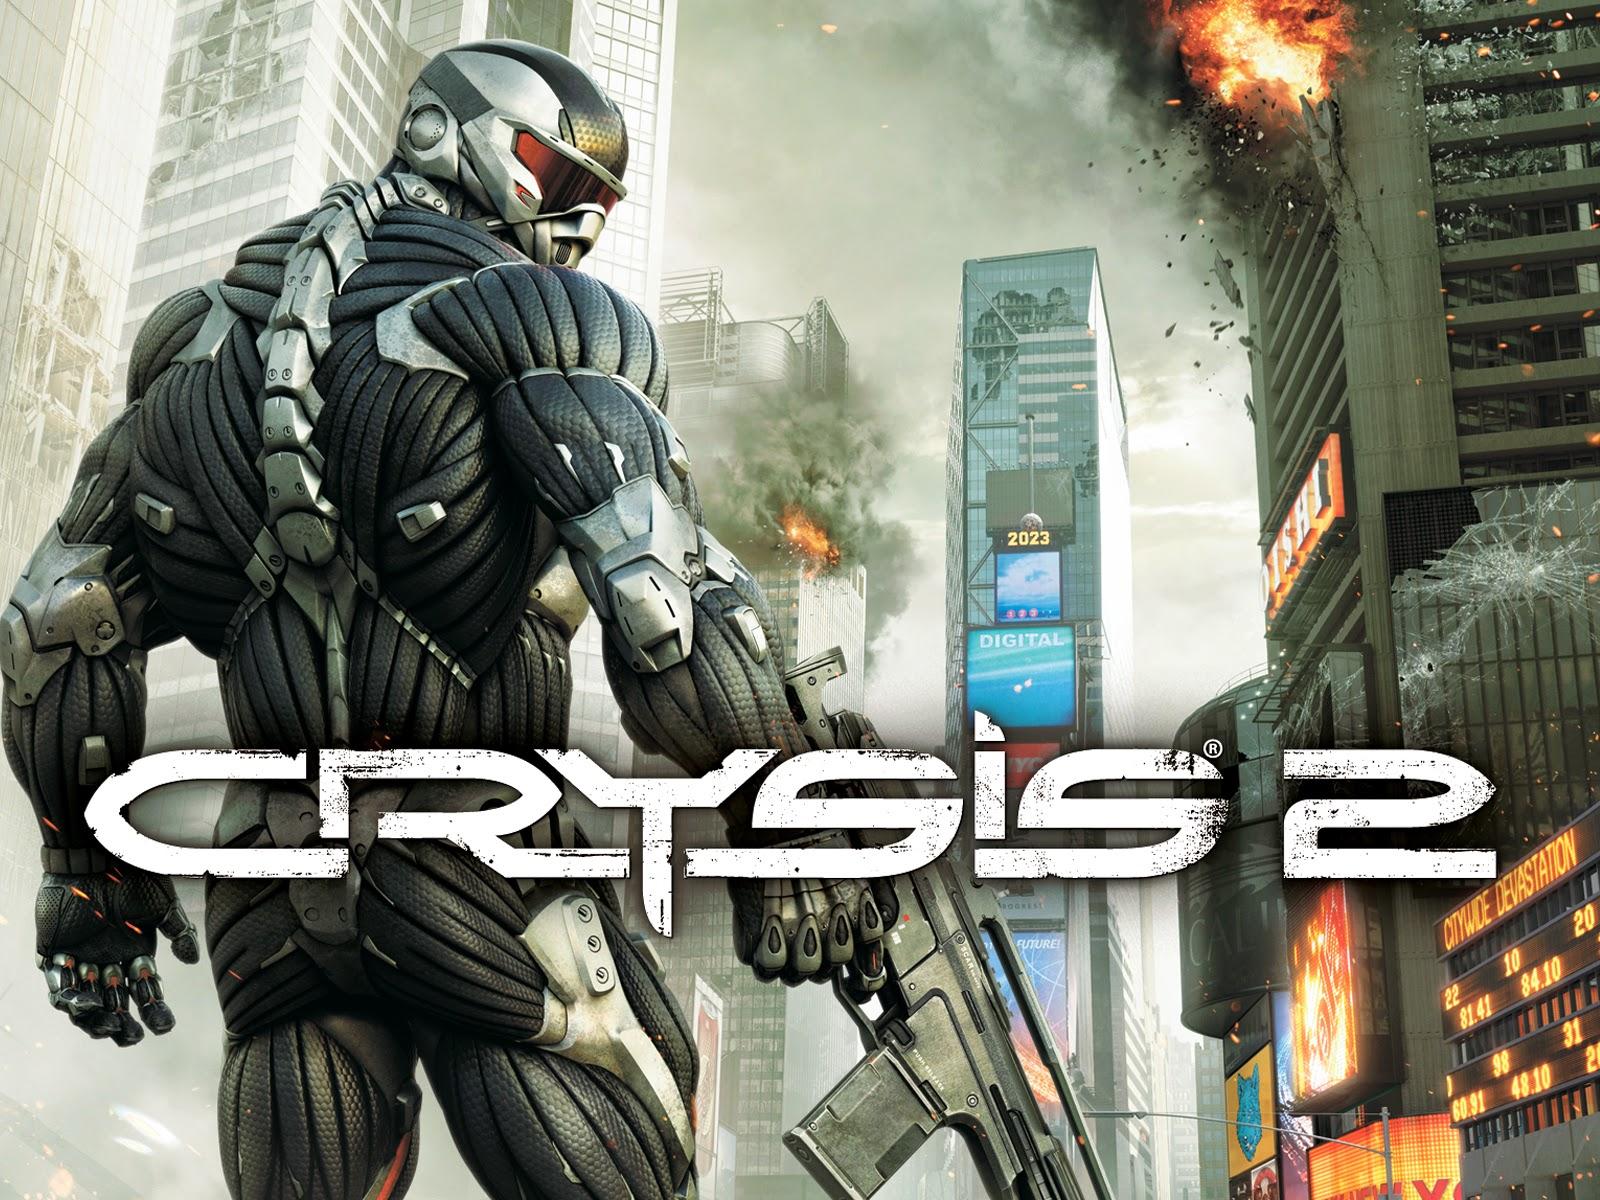 New York City Full Hd Wallpaper Crysis 2 Free Download 171 Igggames